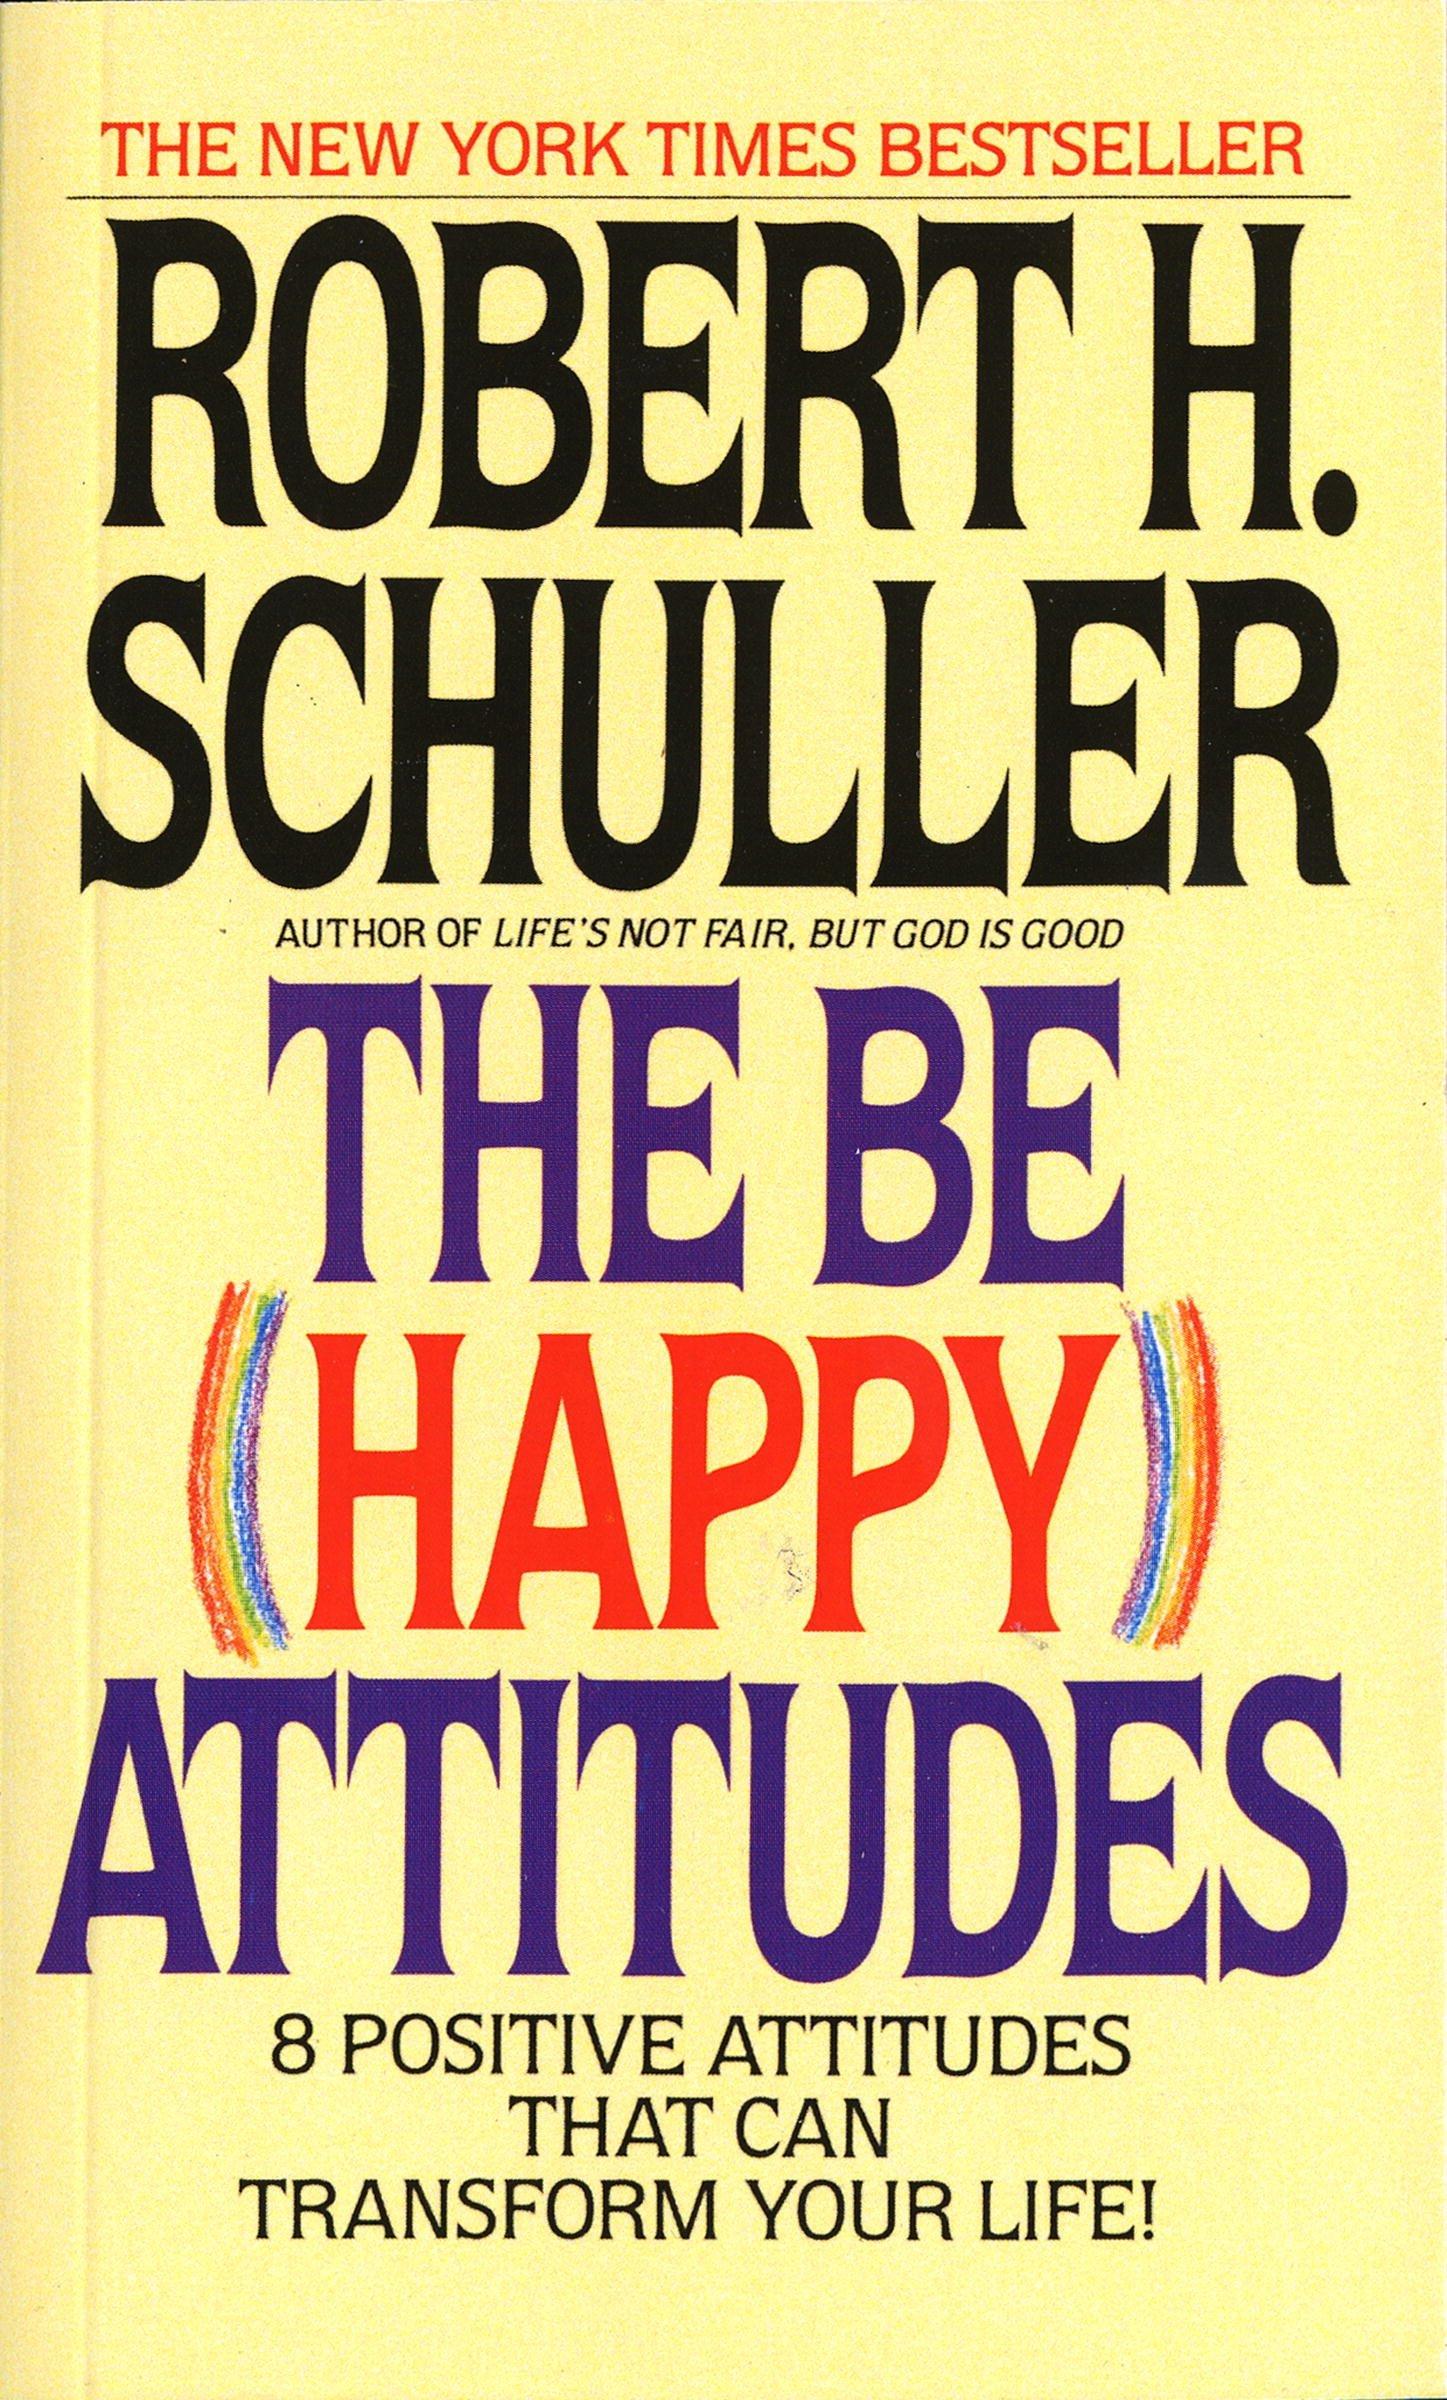 The Be (Happy) Attitudes: 8 Positive Attitudes That Can Transform Your  Life: Schuller, Robert: 9780553264586: Amazon.com: Books